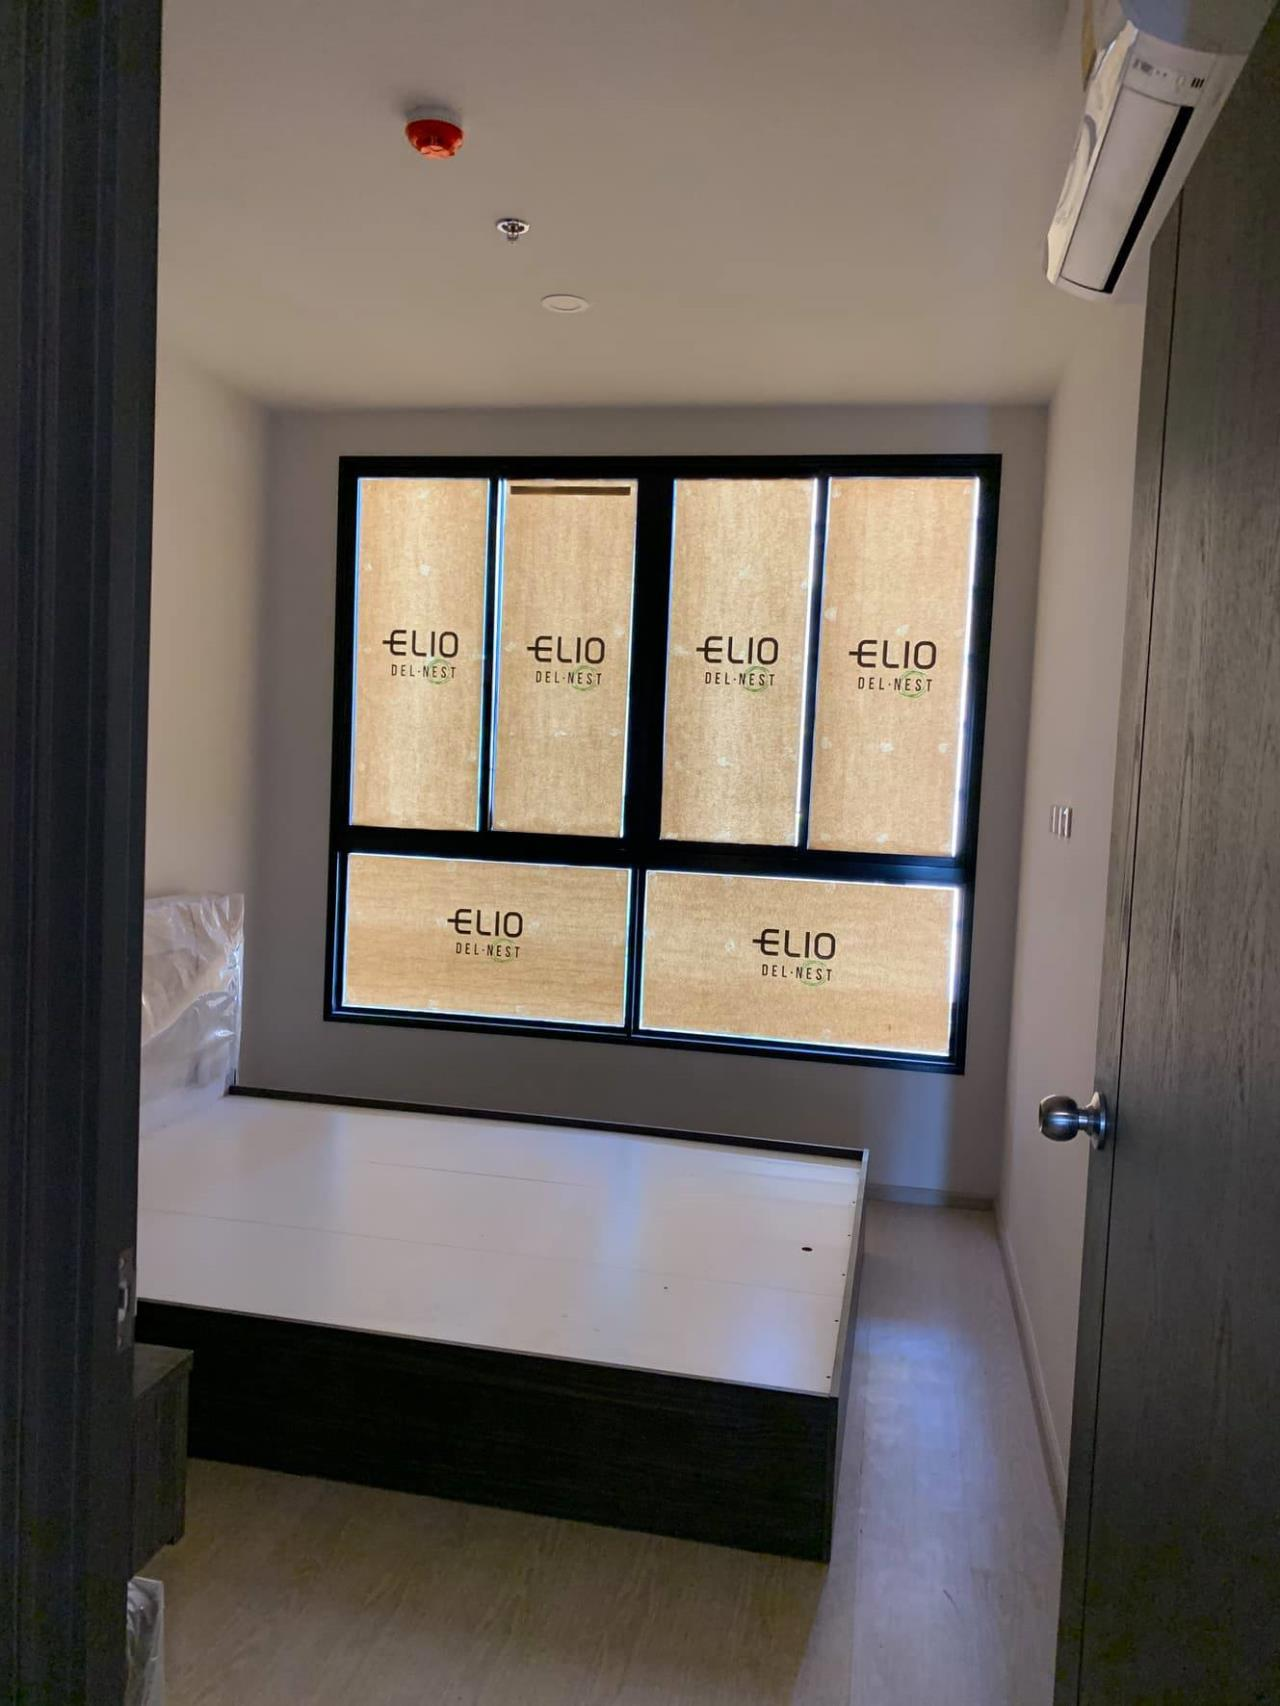 Blueocean property Agency's Condo For Rent – Elio Del Nest ( CODE : 20-06-0057-38 ) 3